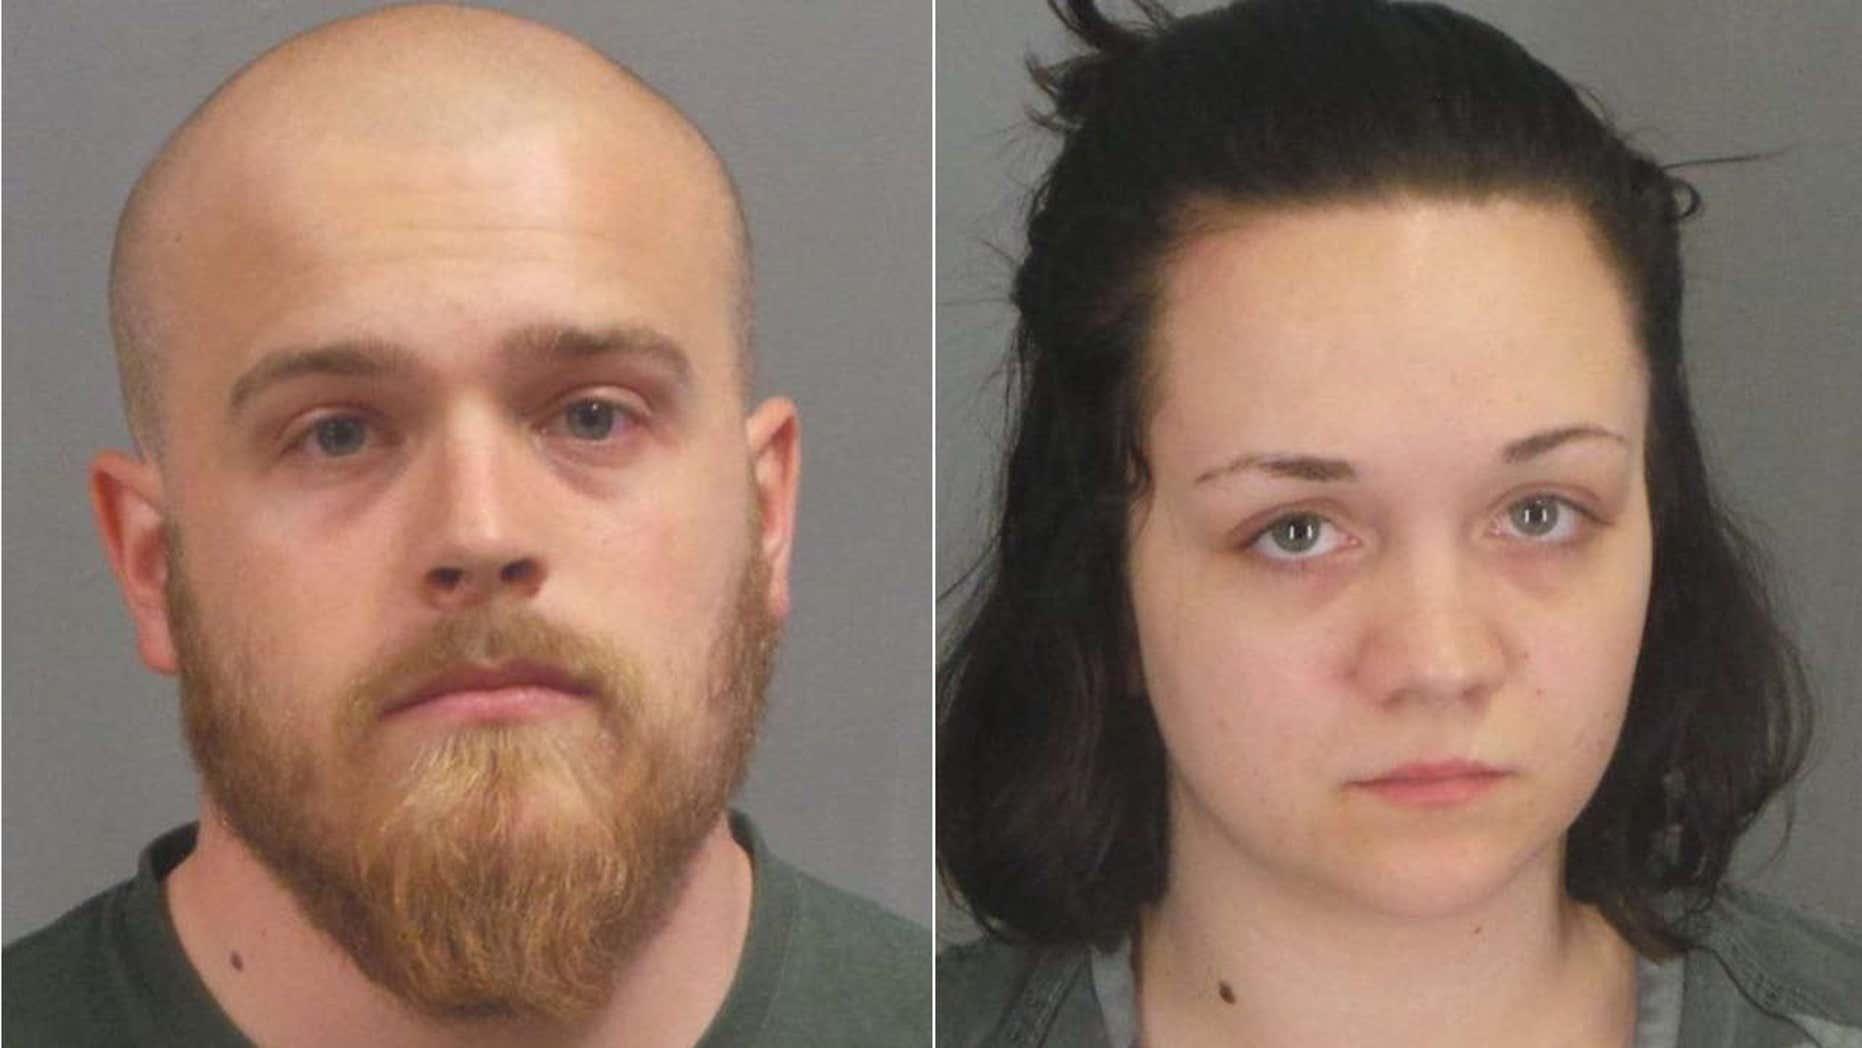 Richard Gamache Jr., 24, and Cheyenne Cook, 19.